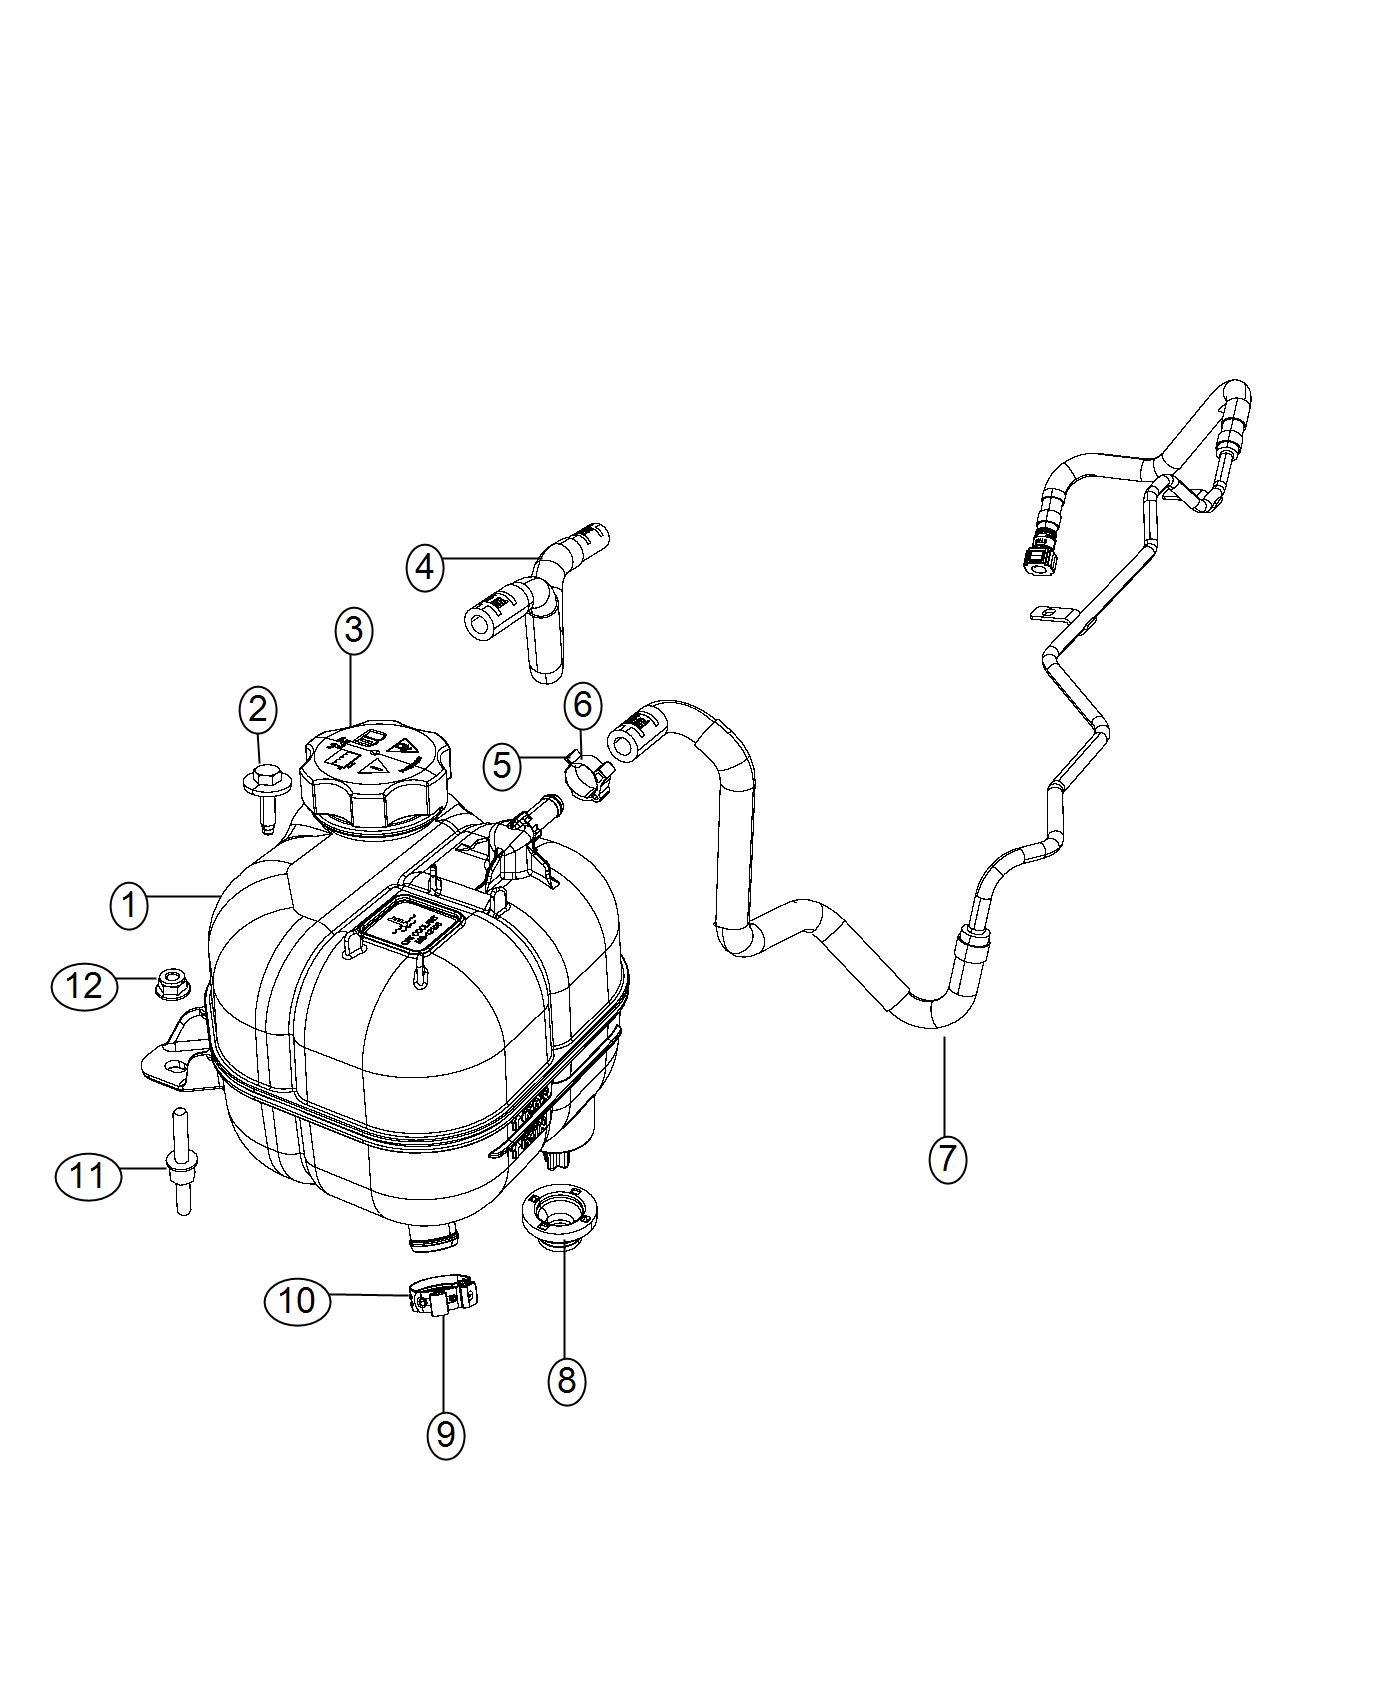 Jeep Cherokee Reservoir Coolant Pressurized